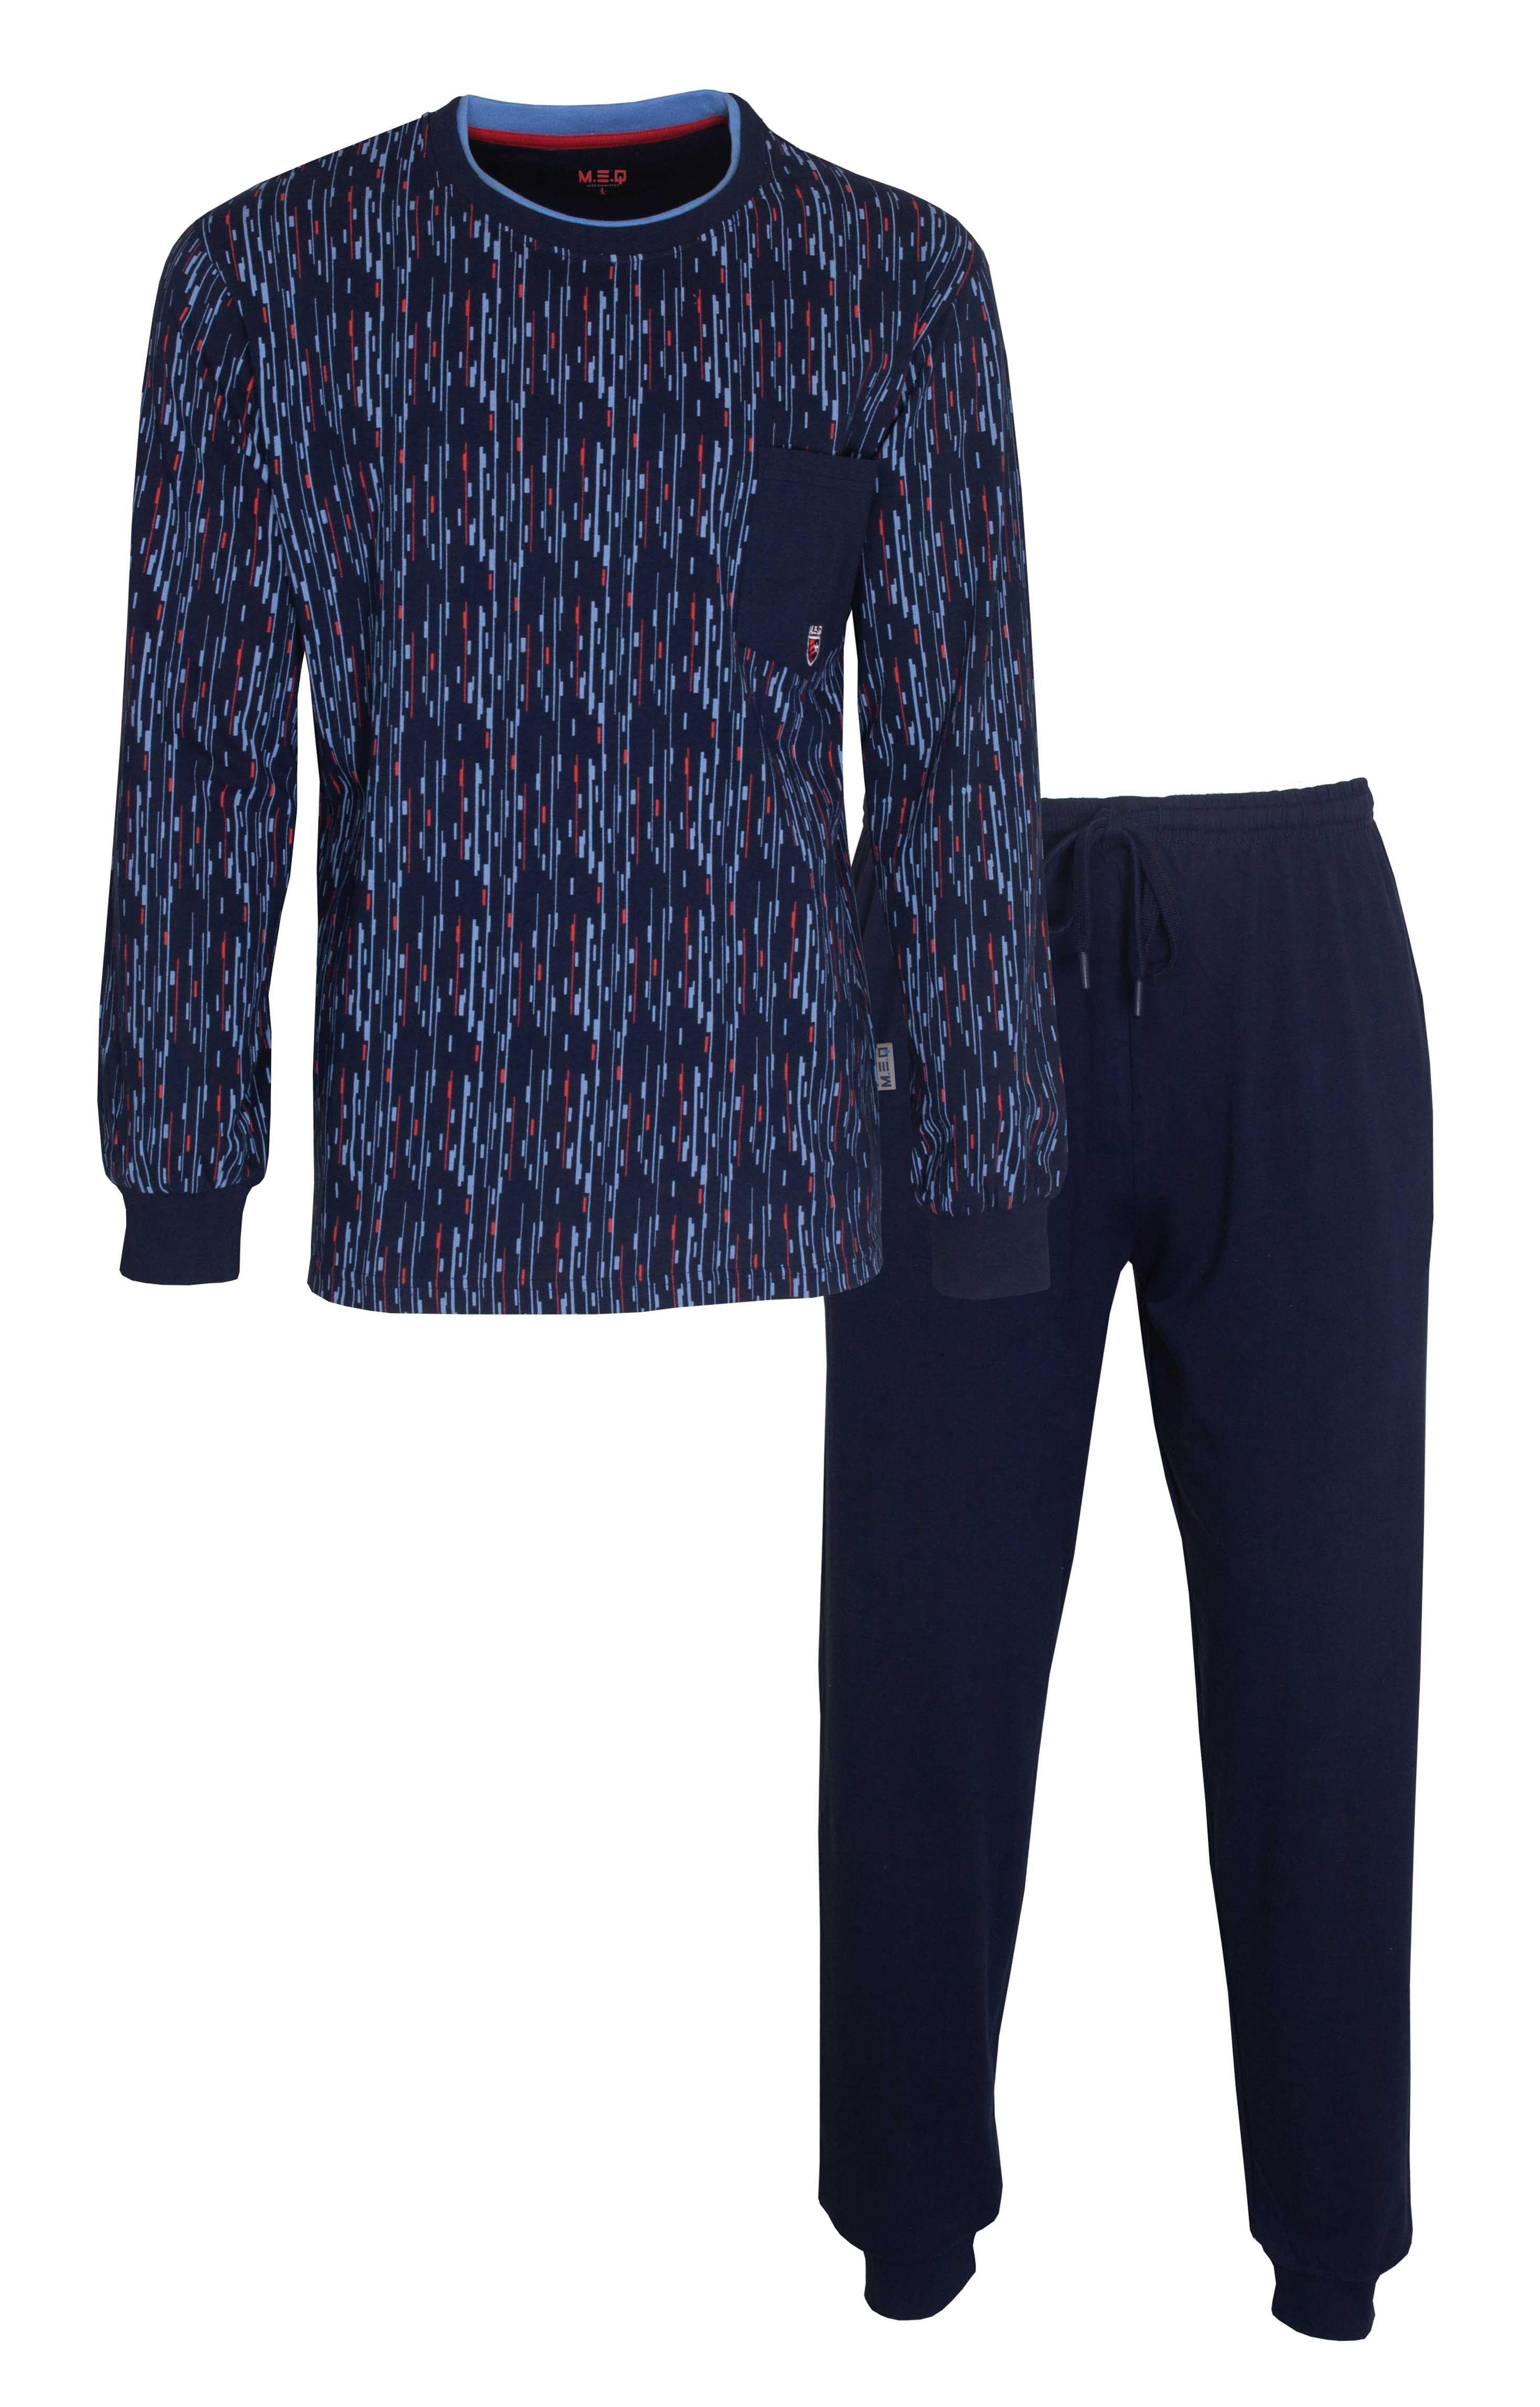 Heren pyjama MEPYH 1107A-S/48